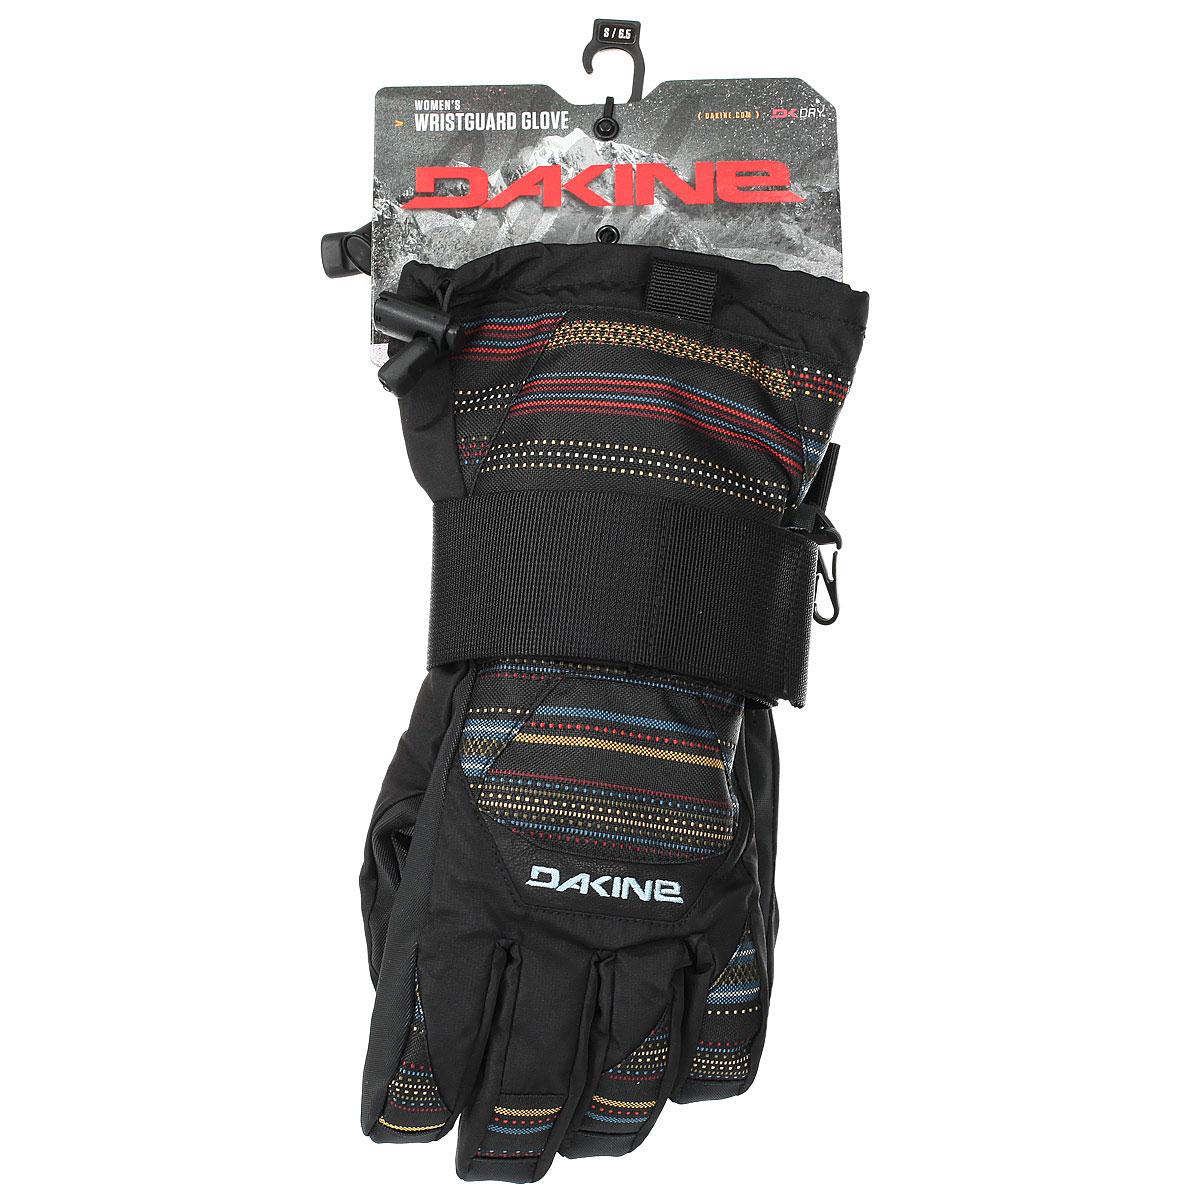 Перчатки сноубордические Dakine Wristguard Glove Nevada